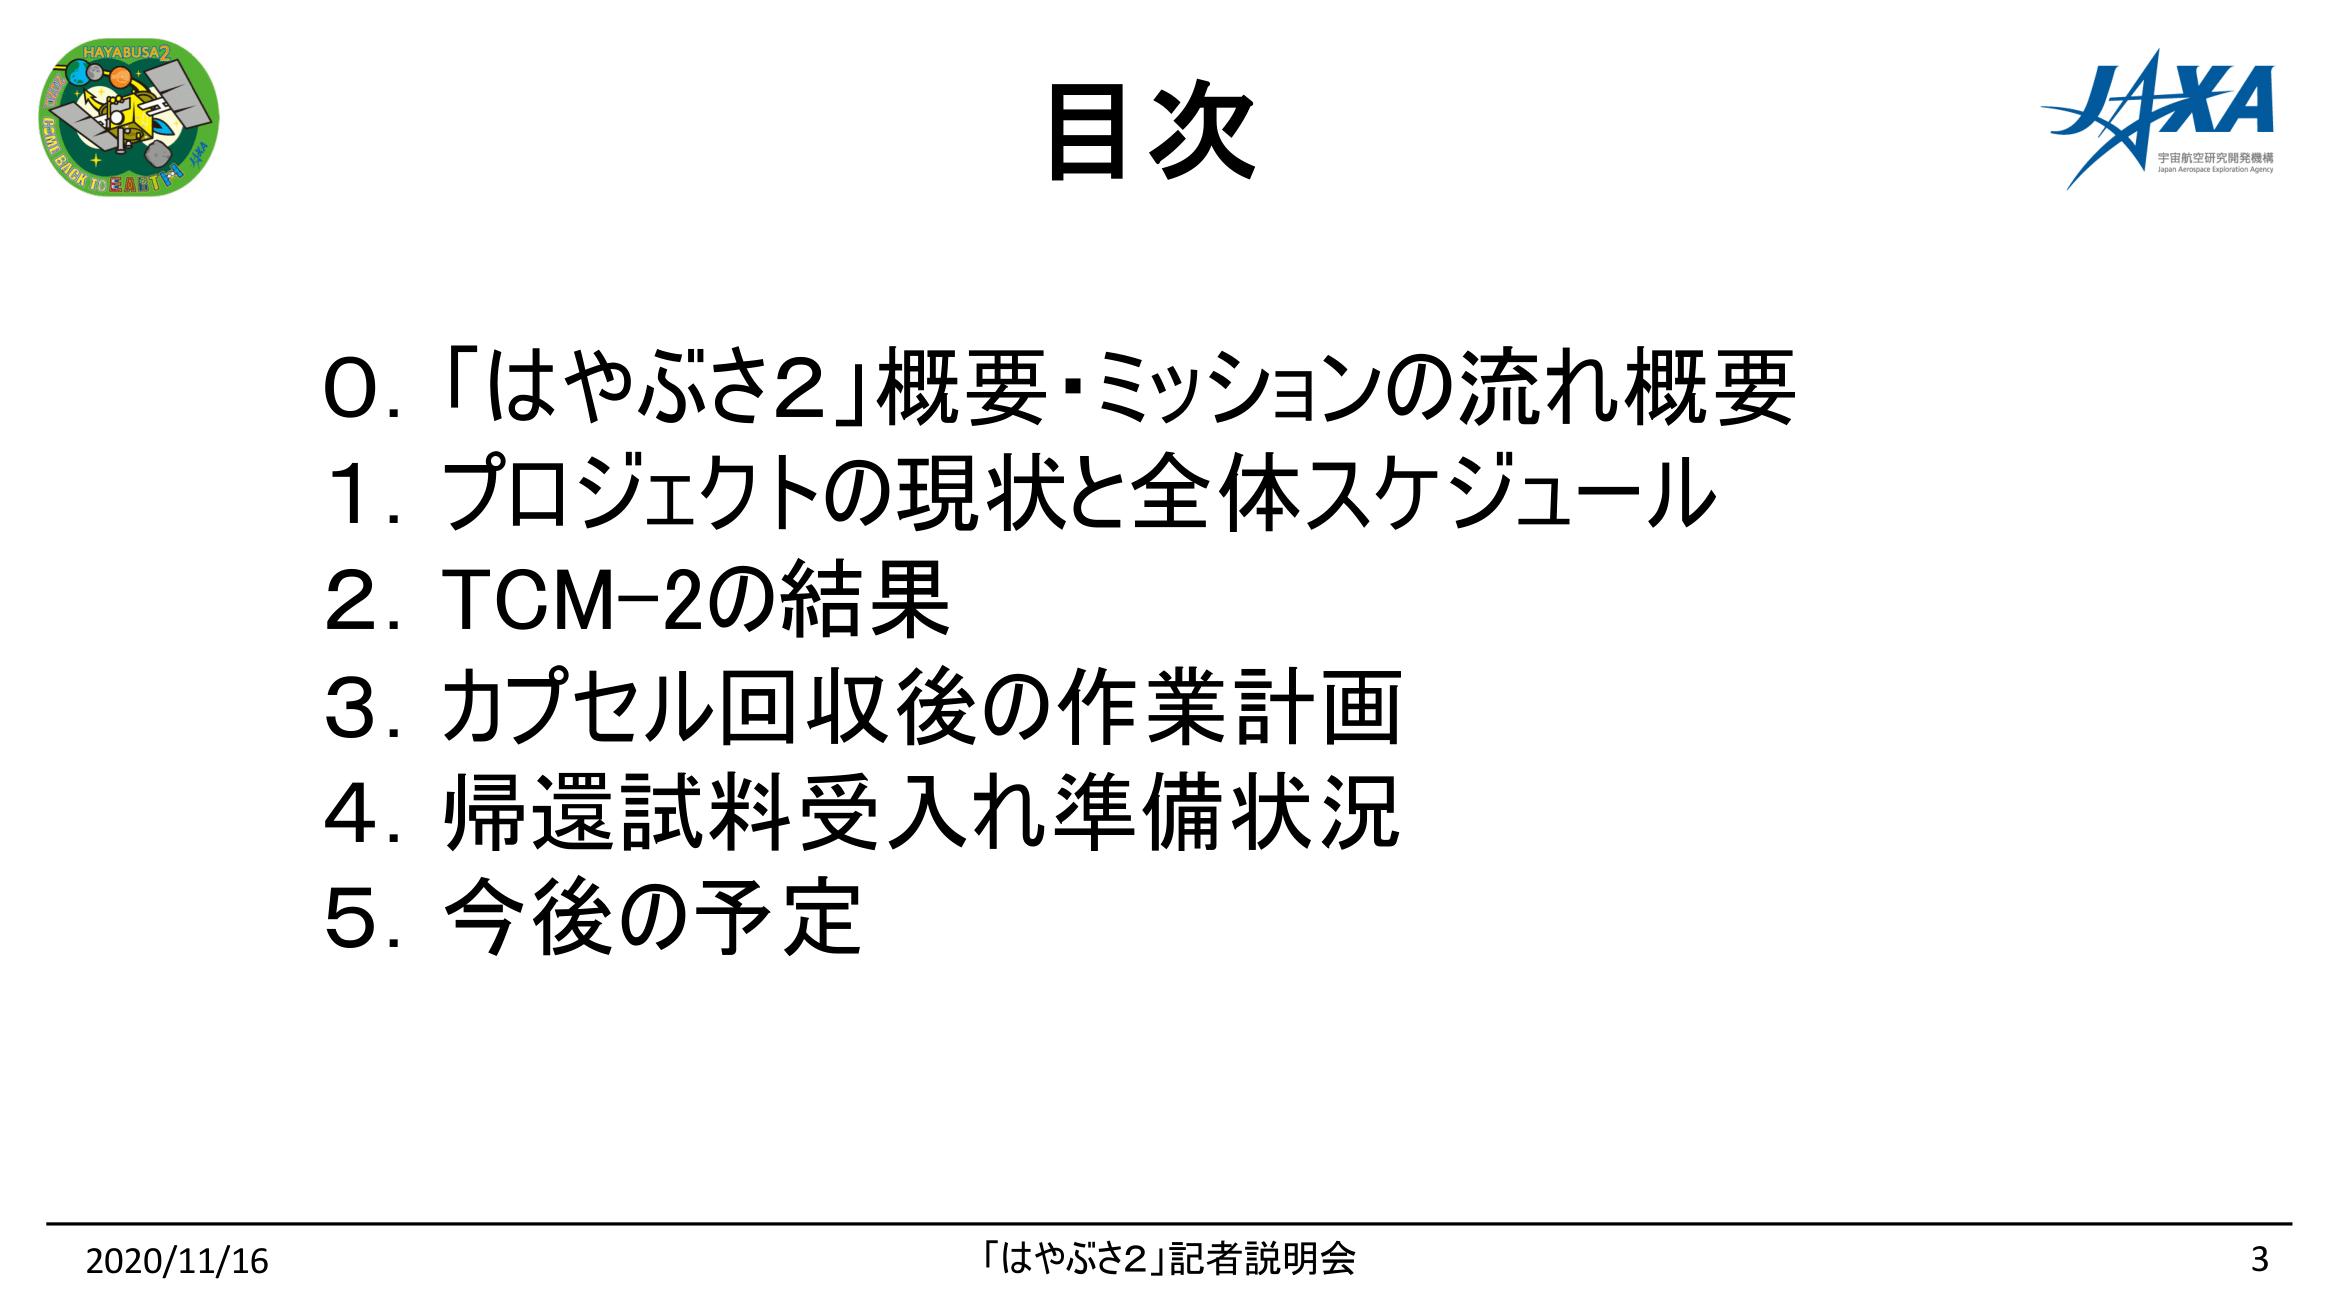 f:id:Imamura:20201116151103p:plain